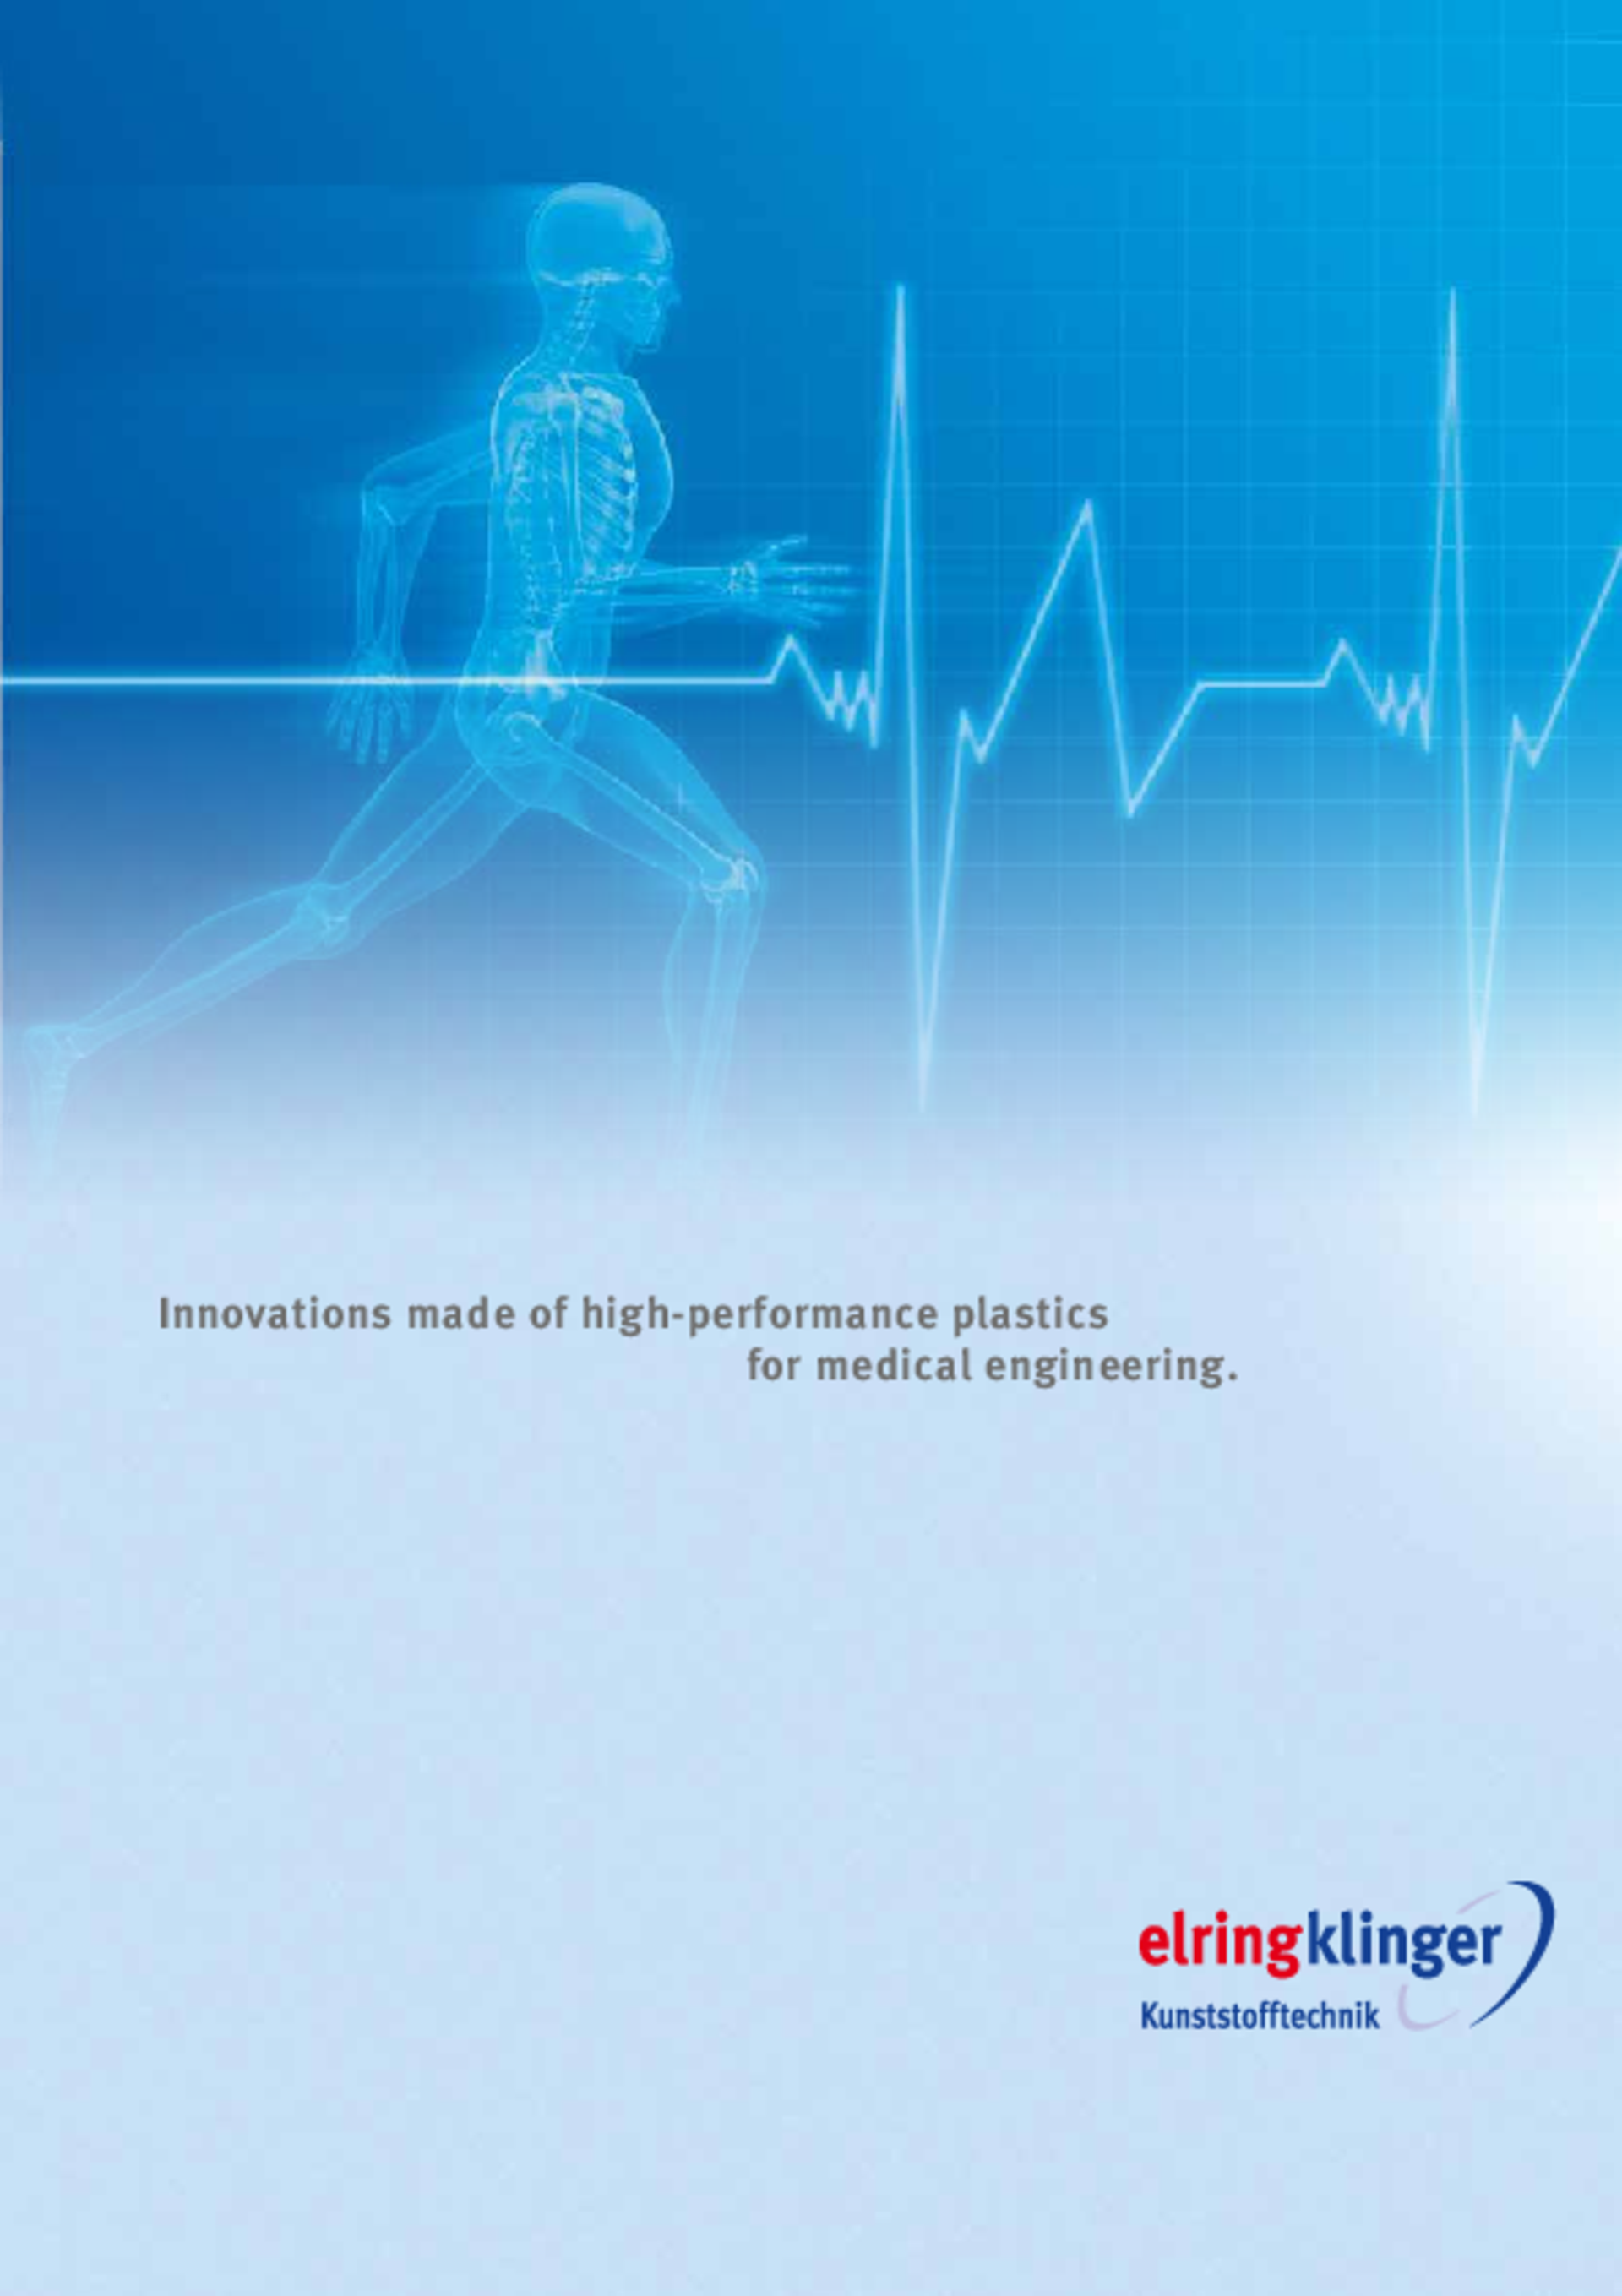 Industry Special: Medical Engineering